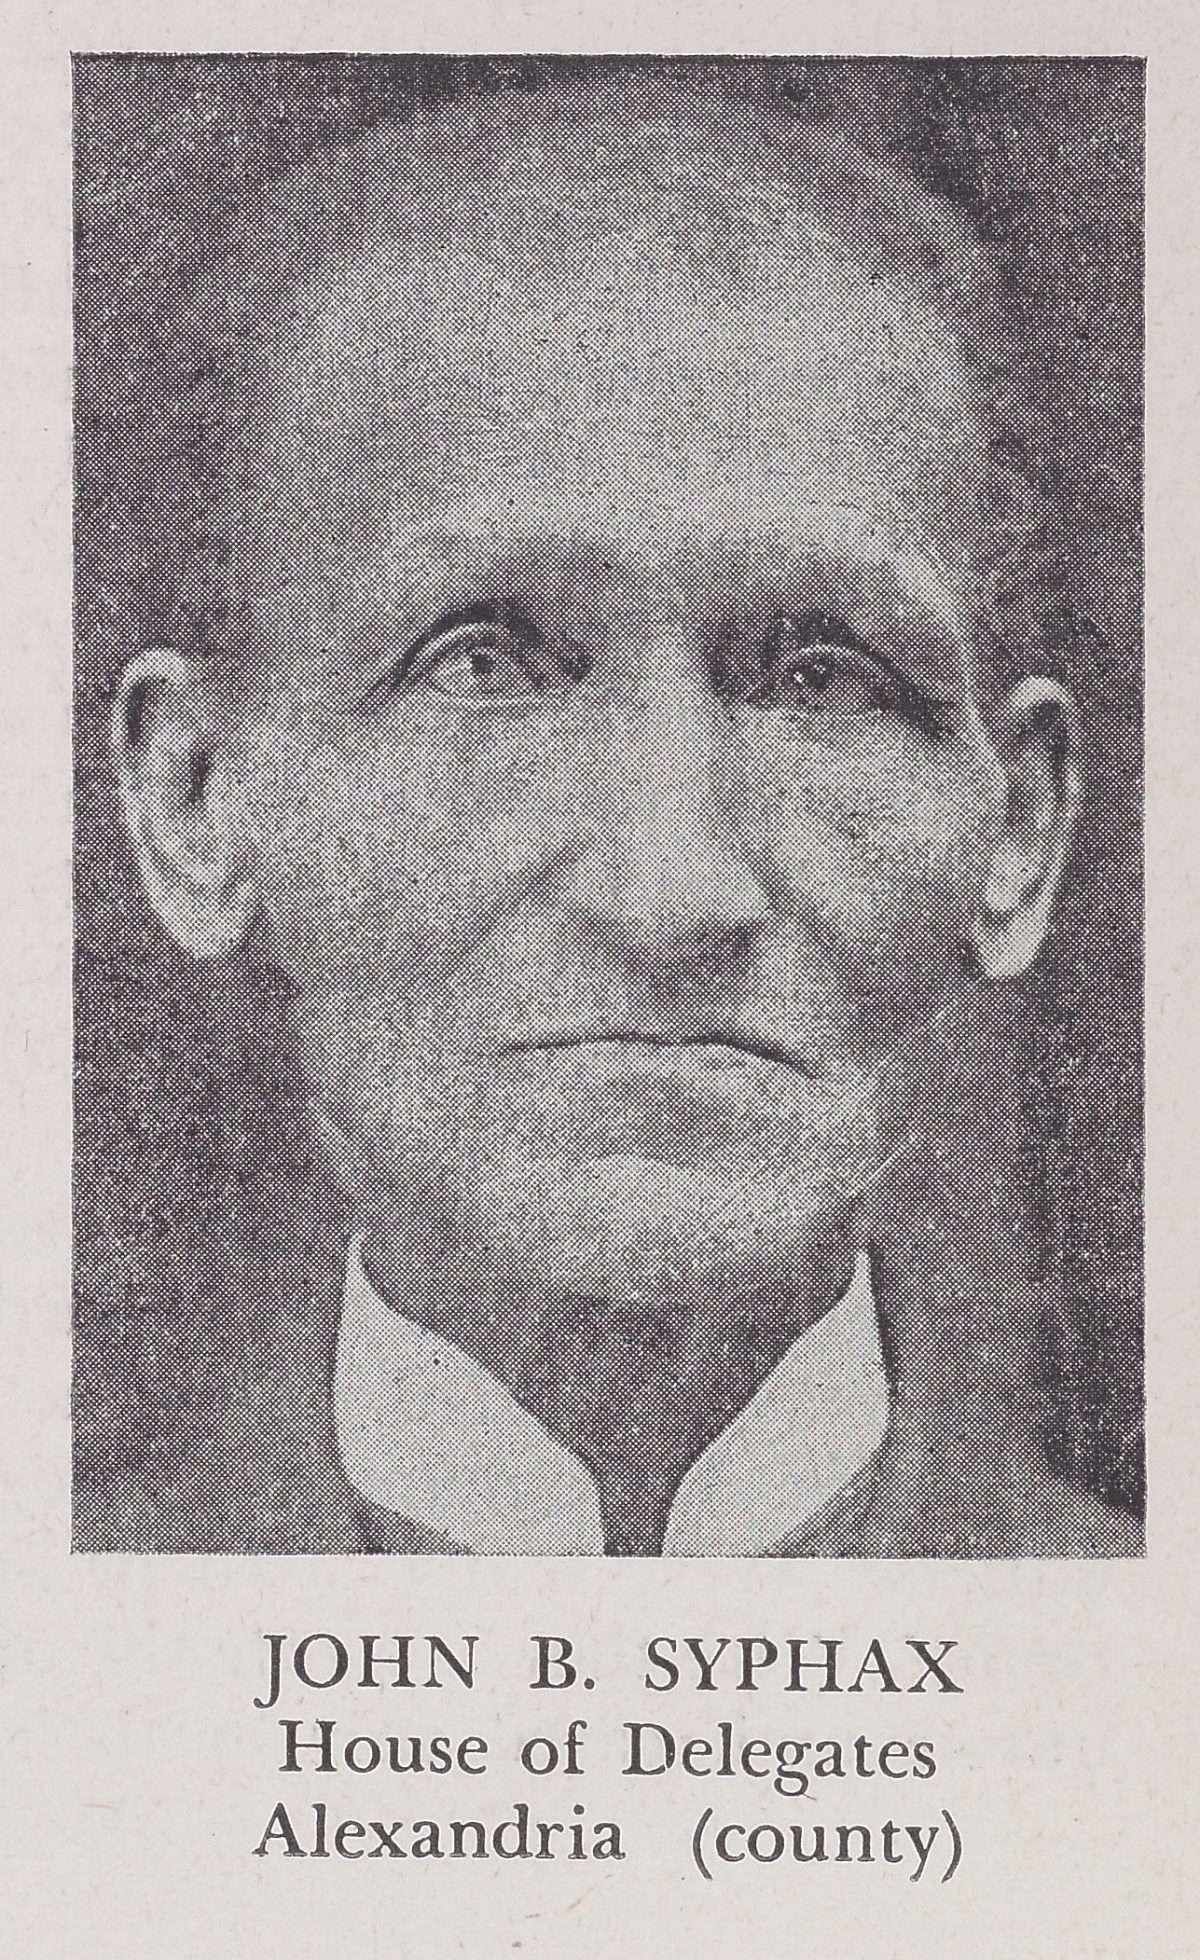 John B. Syphax